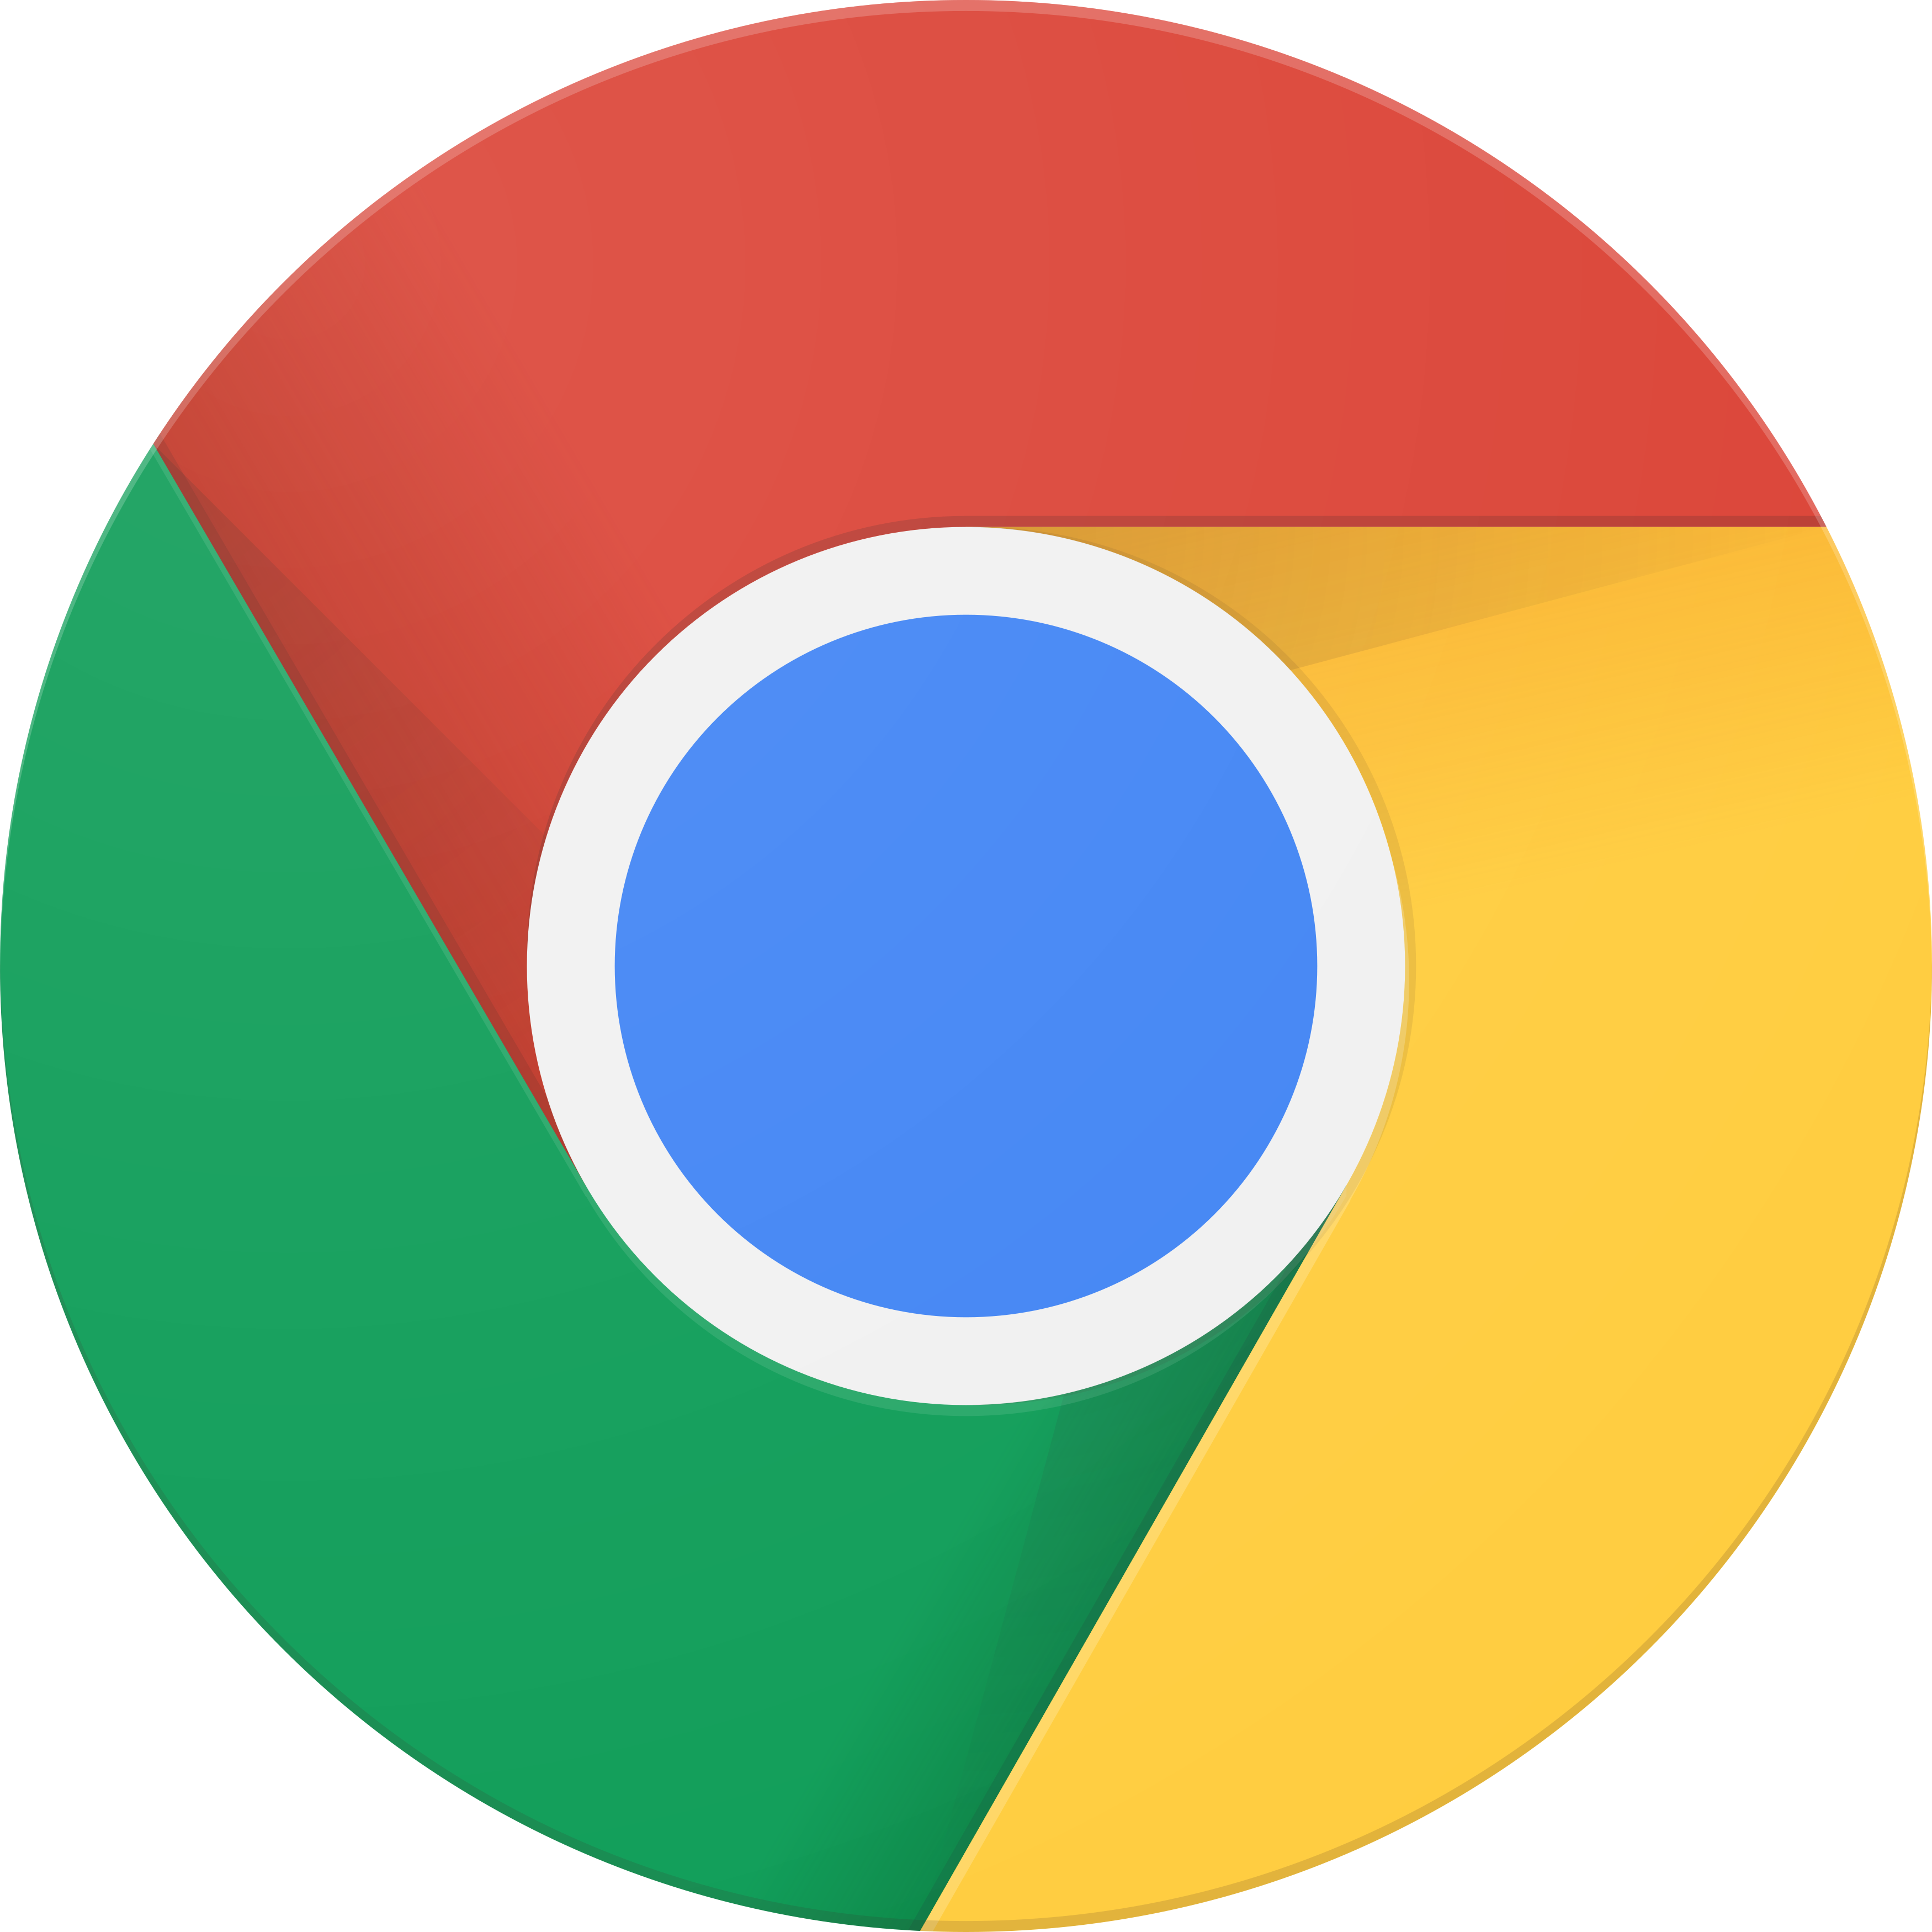 GIMP Logo Google Logo Image.